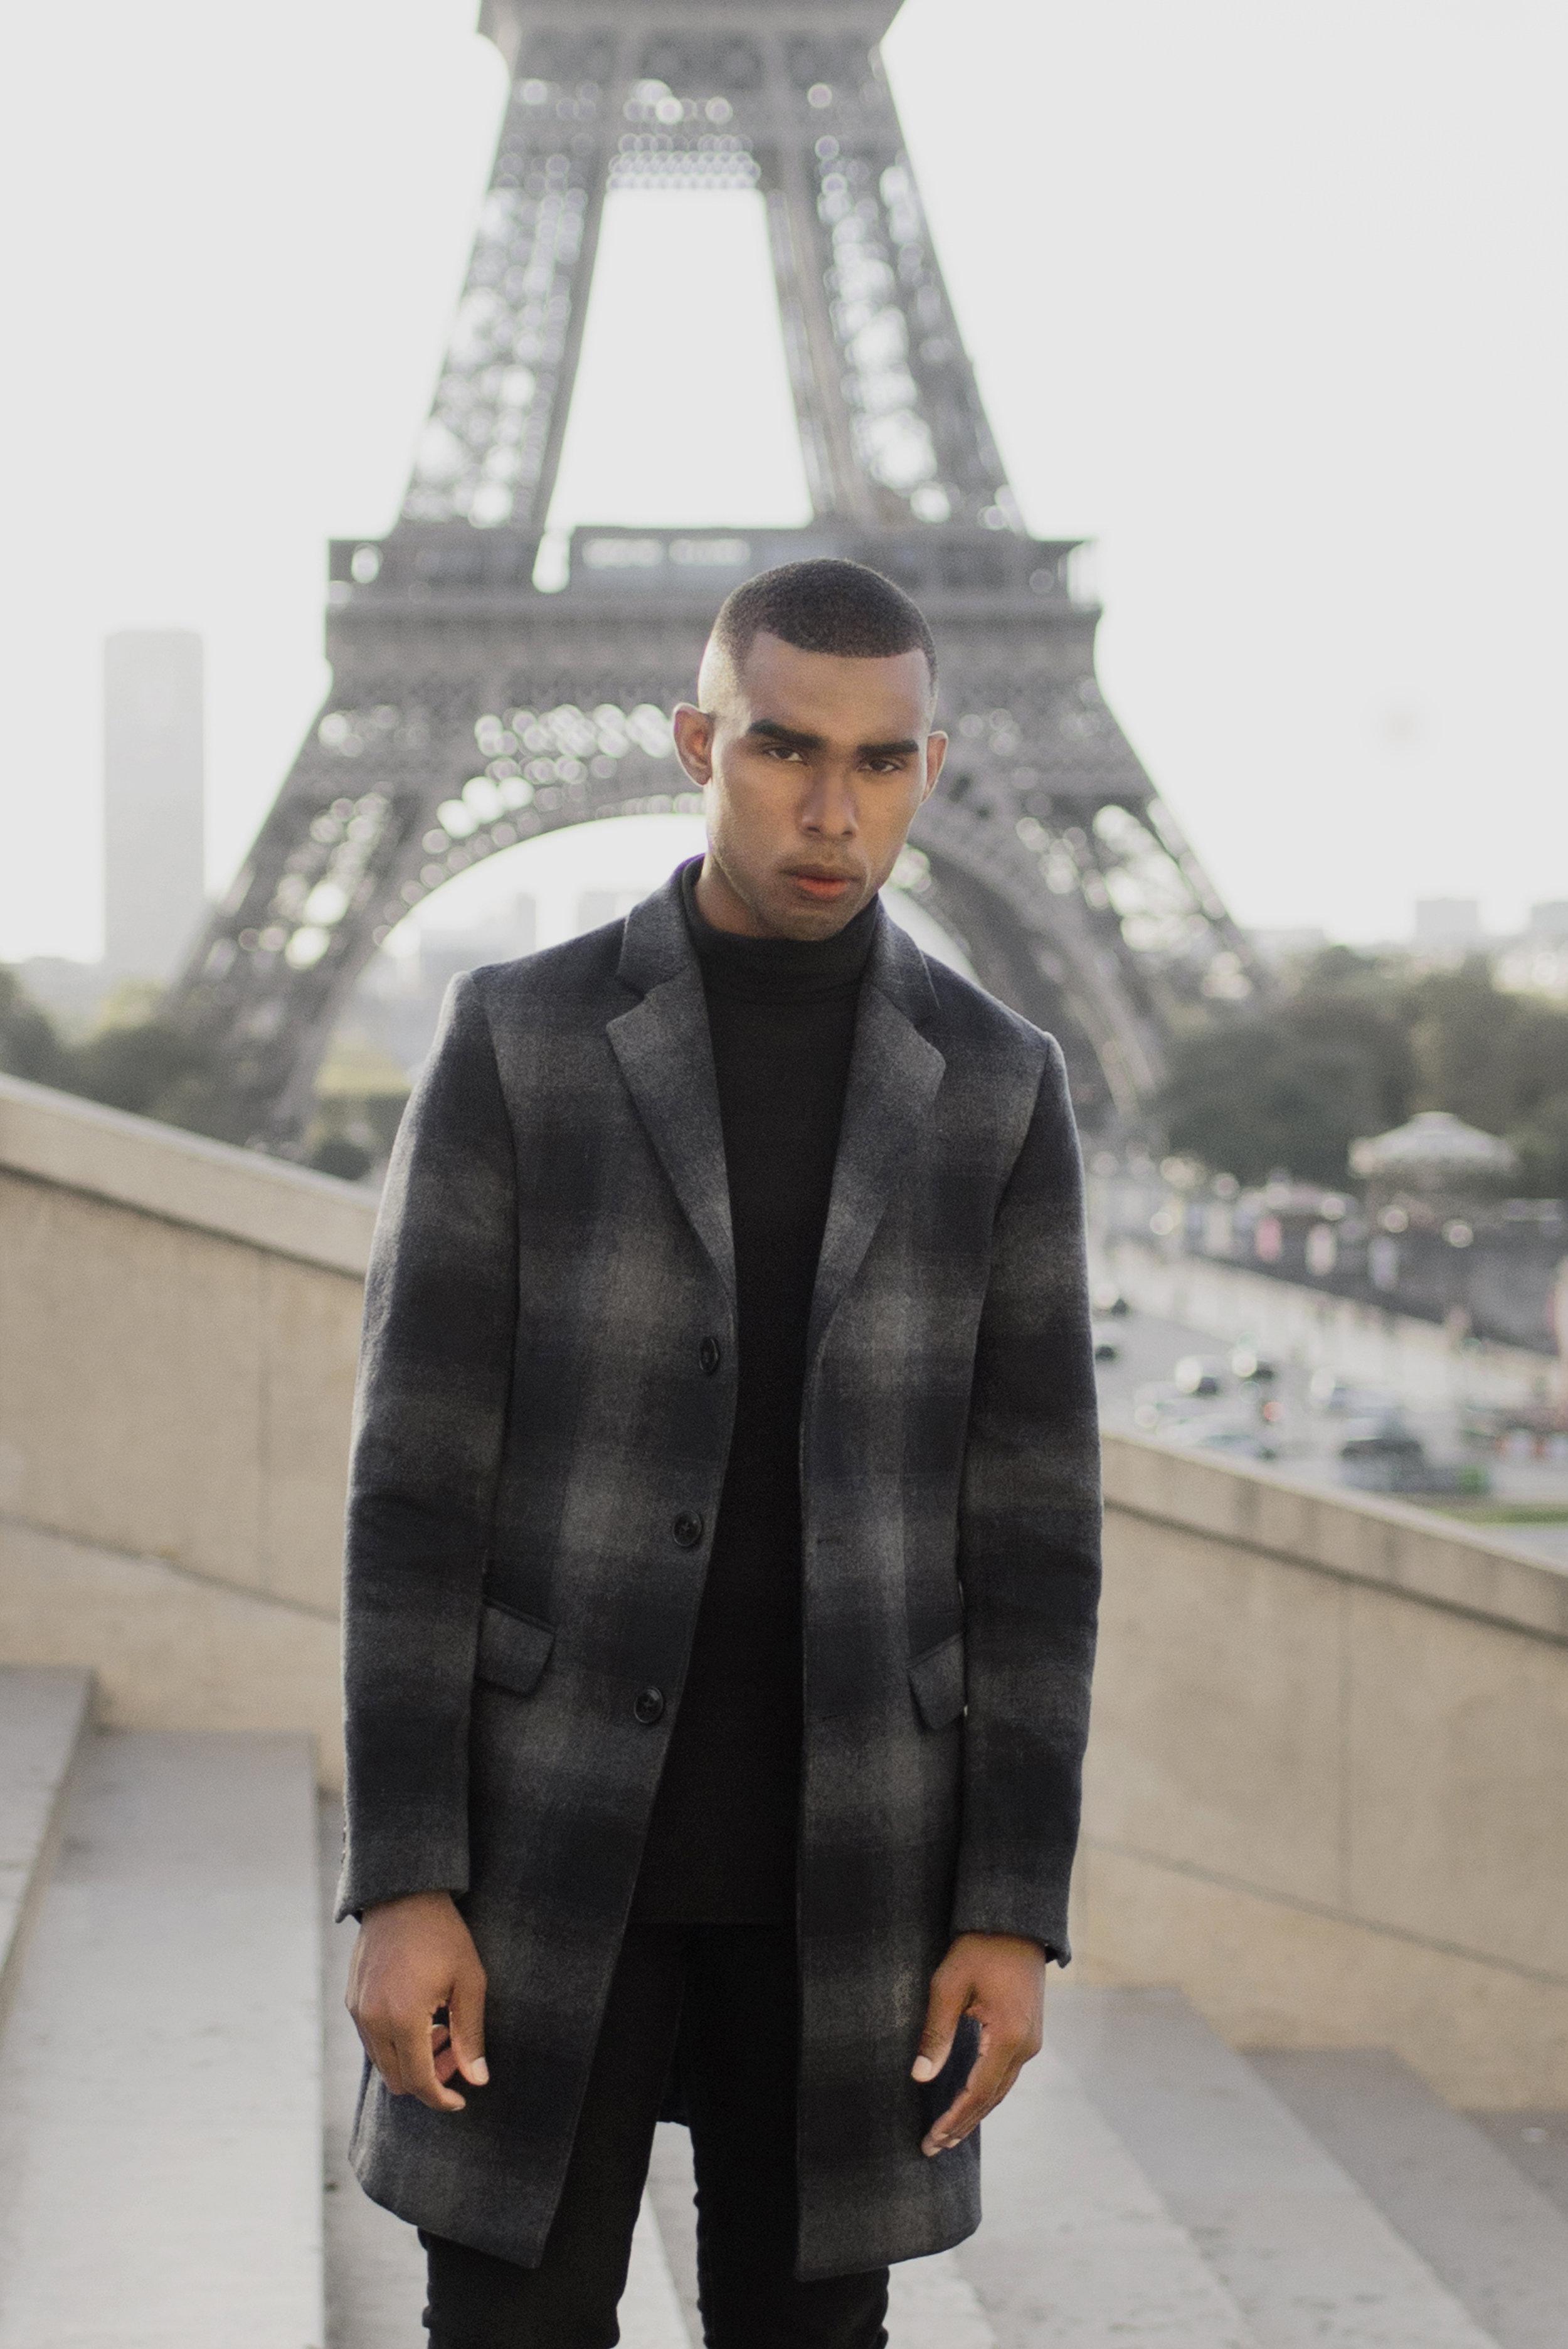 The-Look-Principle-Paris-Fashion-Week-Part2-4.jpg